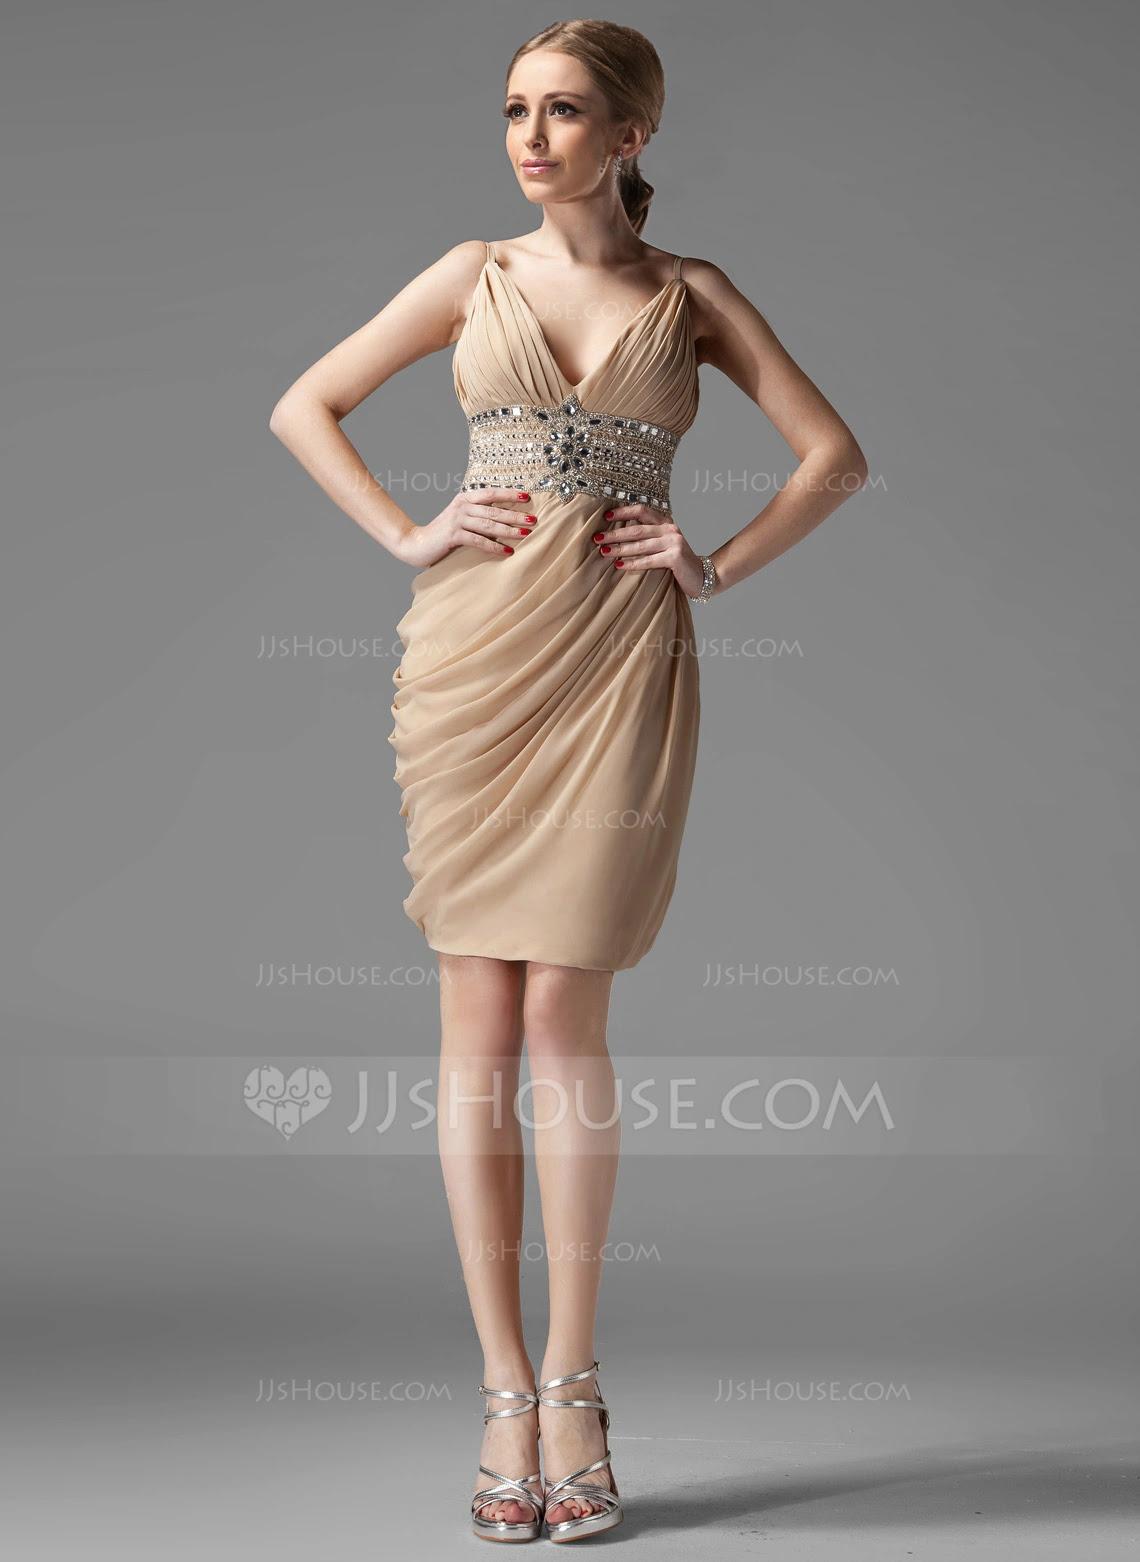 Jjshouse short evening dresses